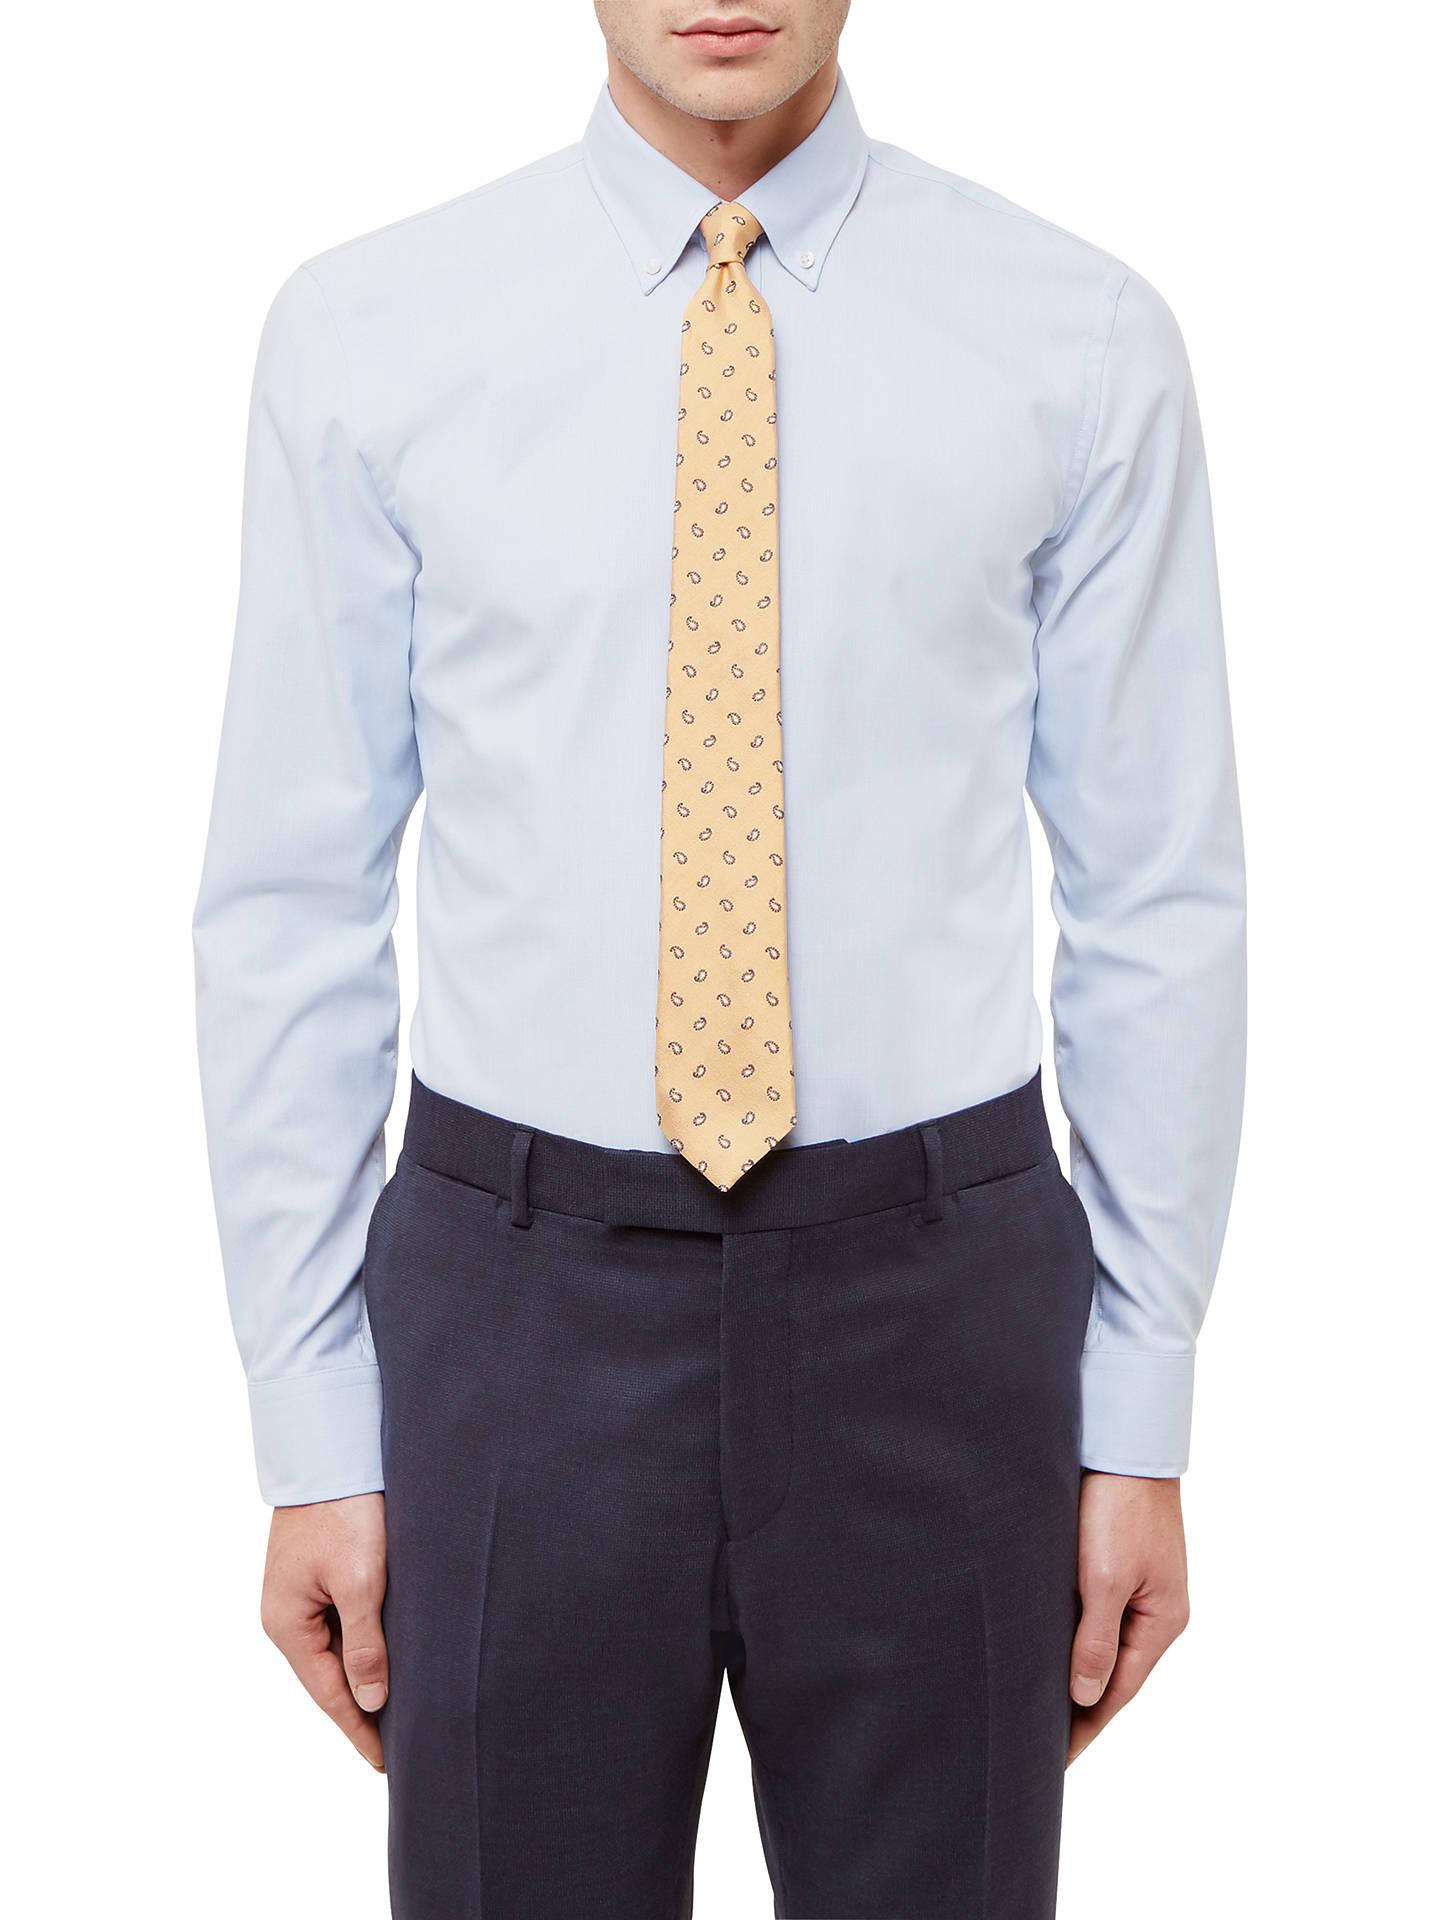 ccd53c70 Buy Jaeger Vertical Stripe Slim Fit Cotton Linen Shirt, Light Blue, 15  Online at ...